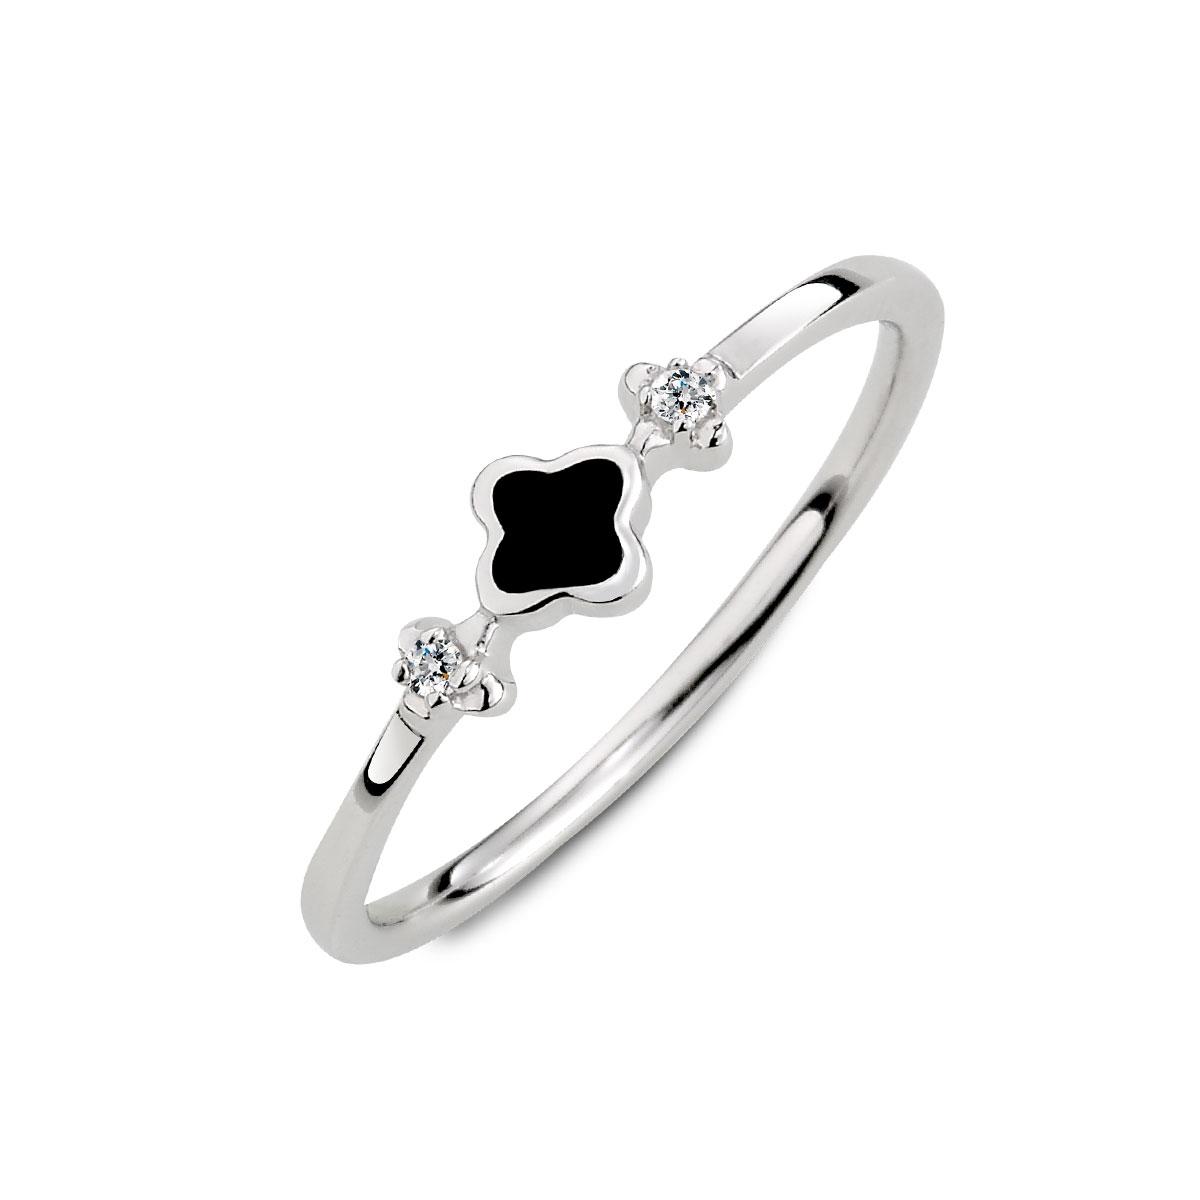 KSW216 細緻花朵簡約姊妹戒指